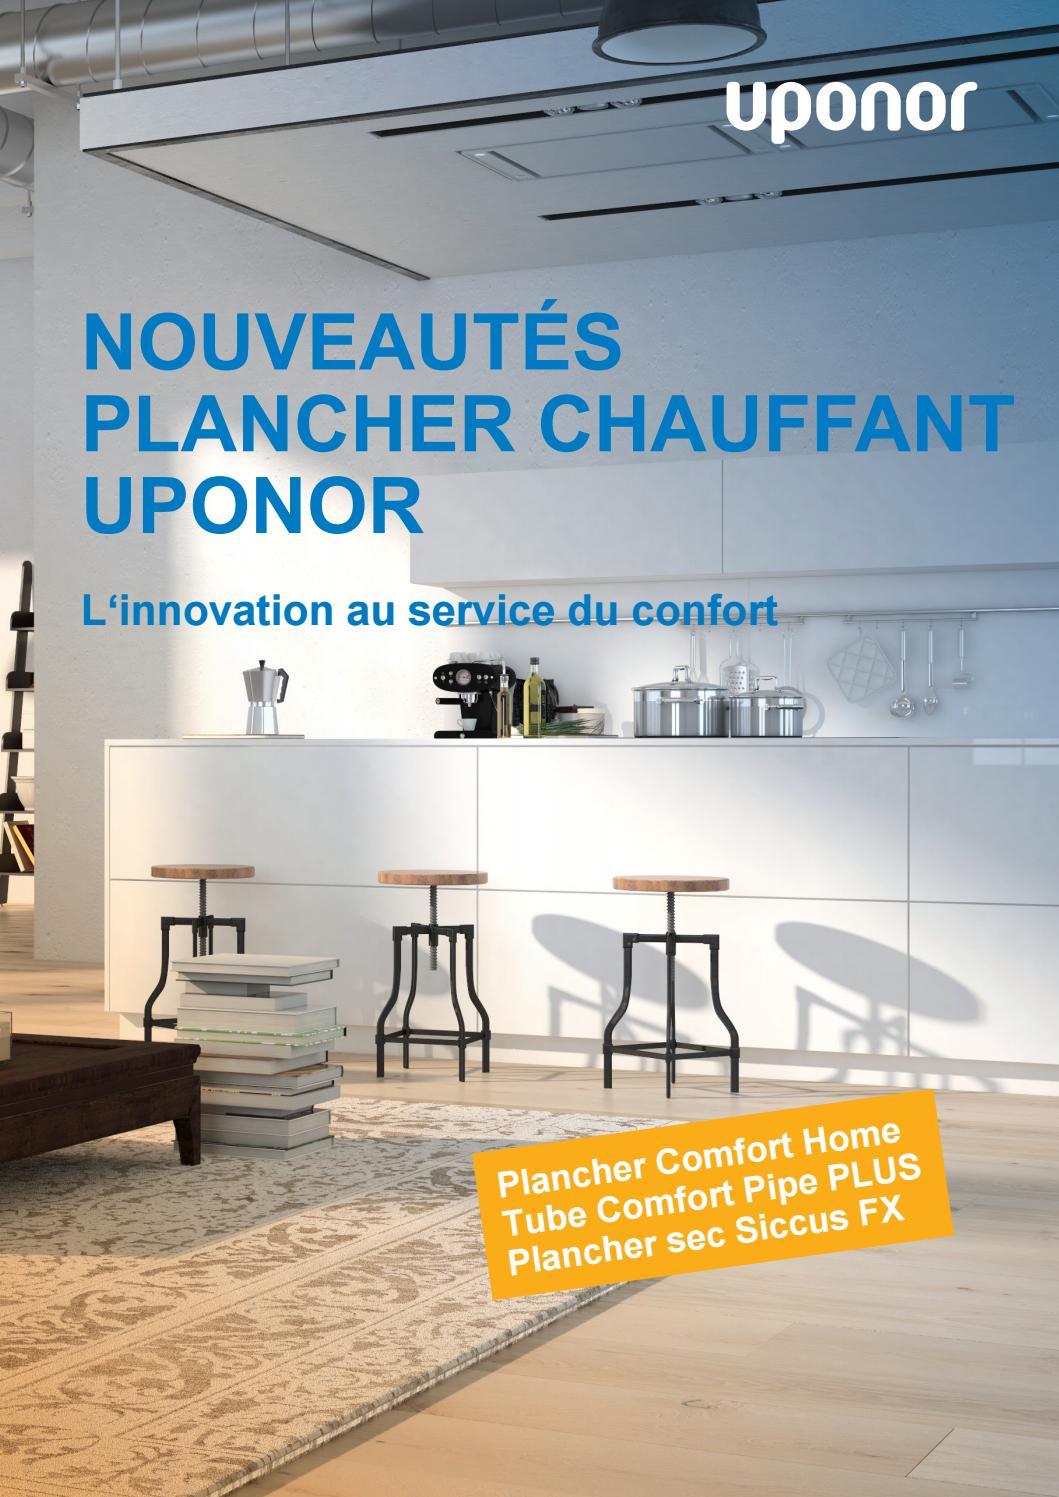 Coût Plancher Chauffant Hydraulique brochure plancher chauffant uponoruponor france - issuu